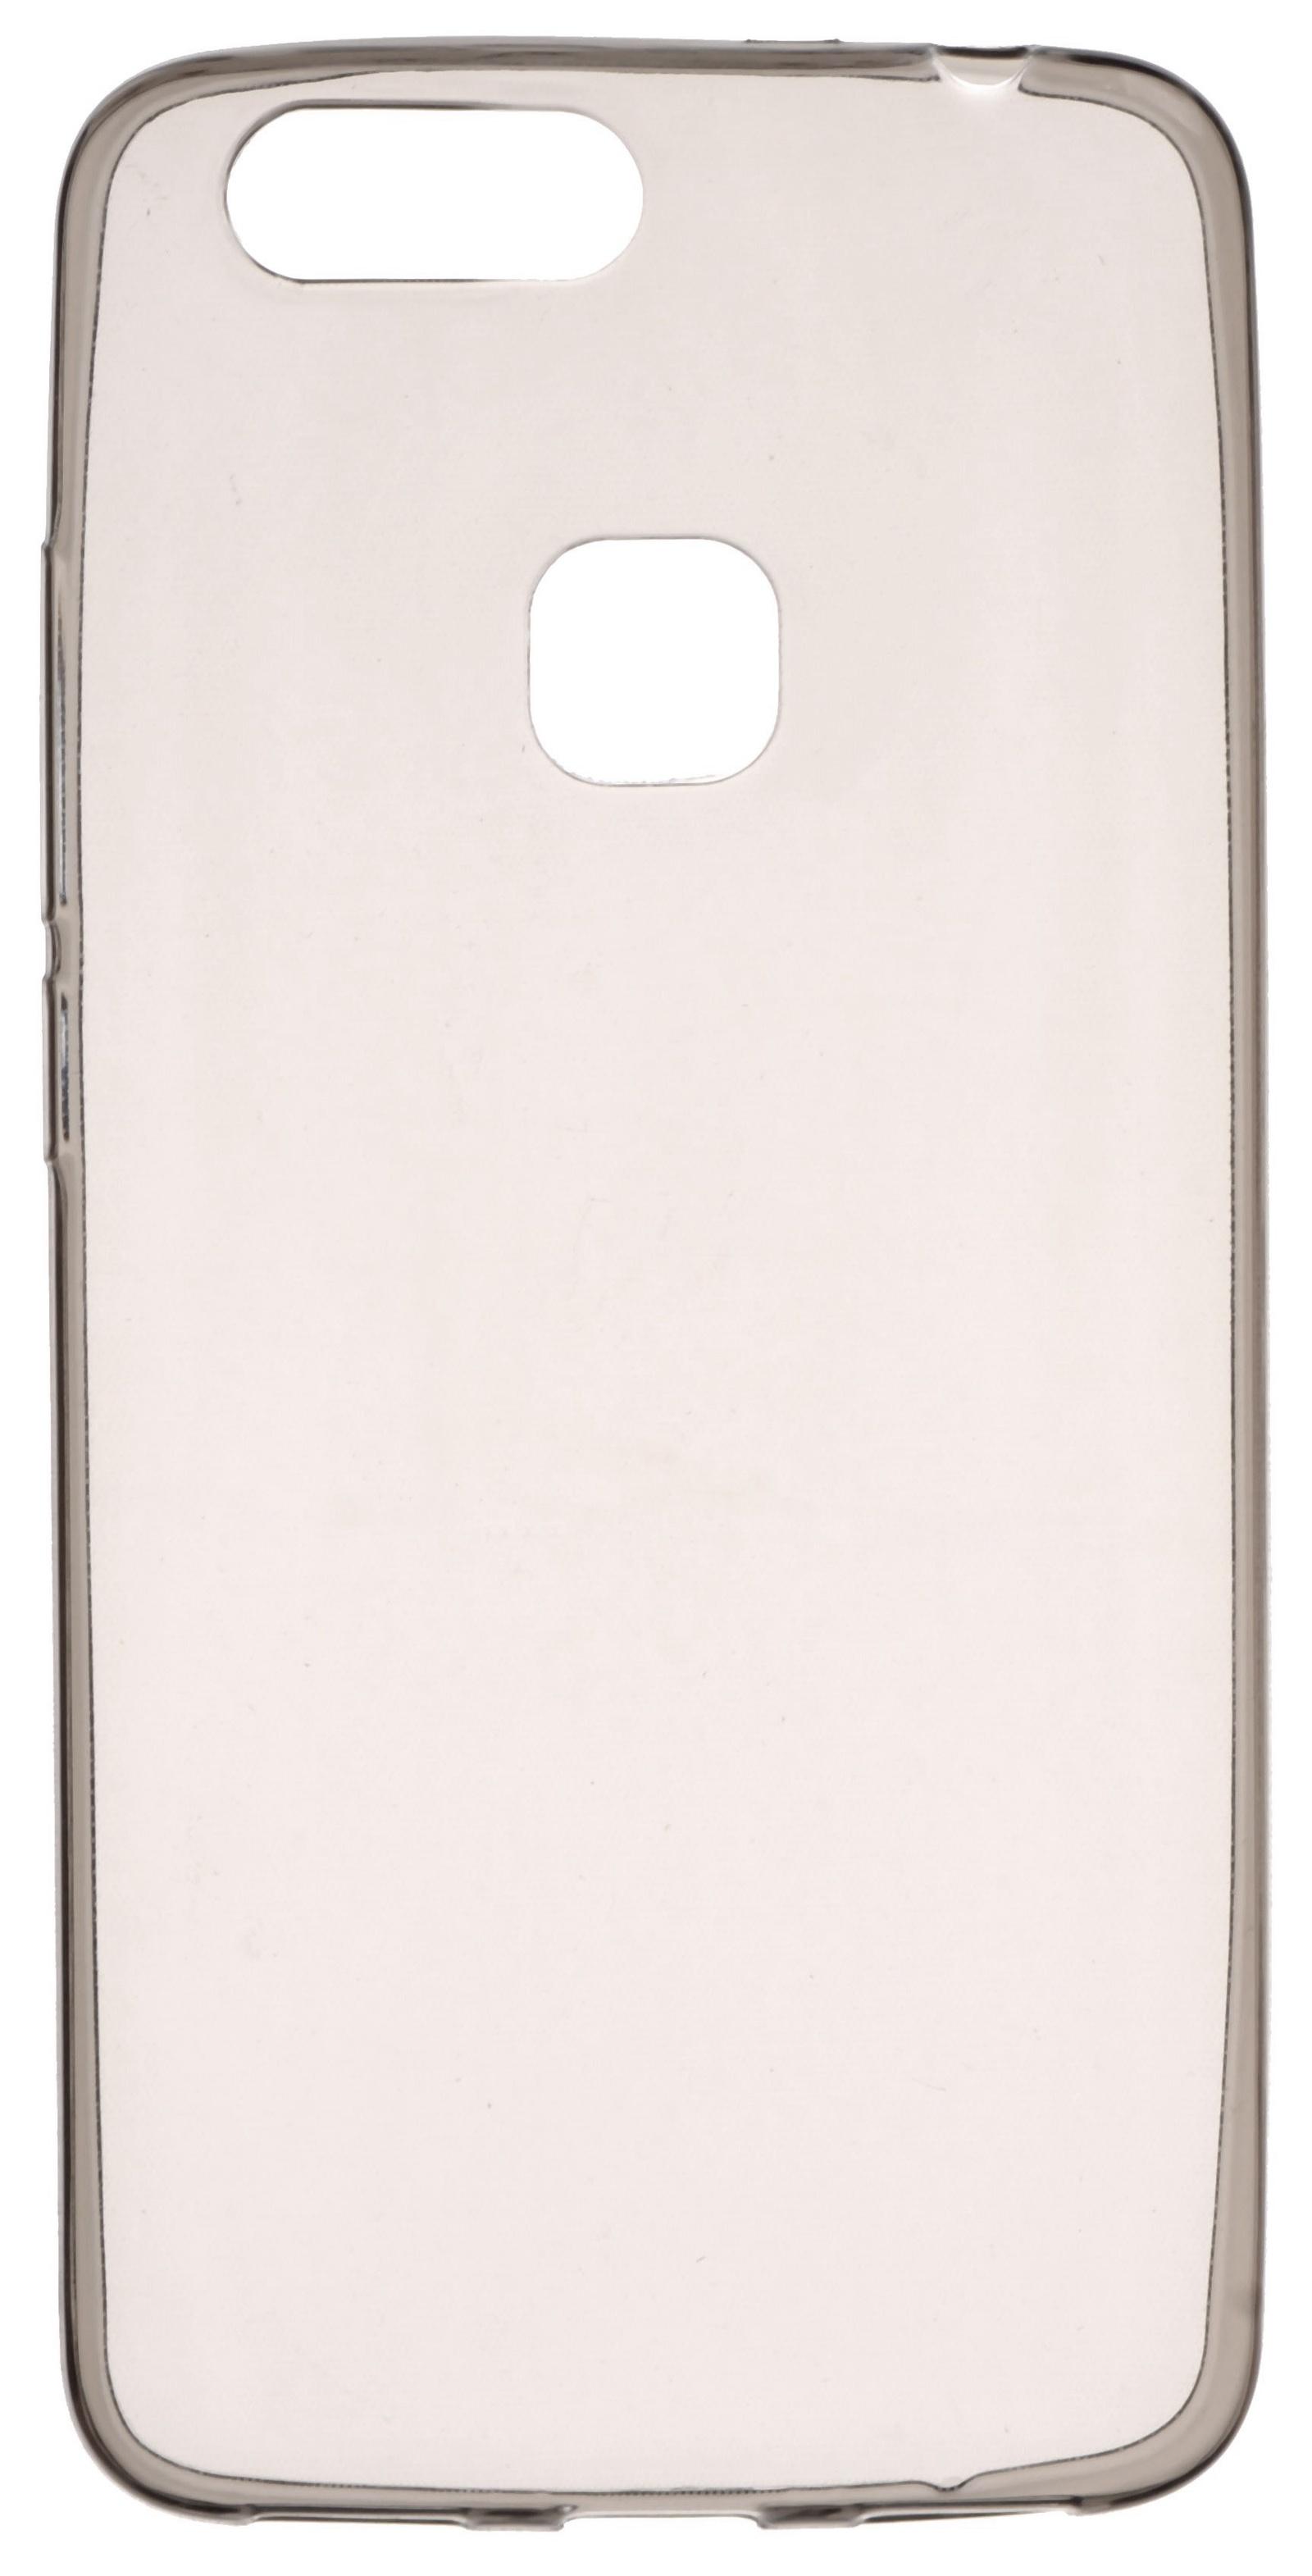 Чехол для сотового телефона skinBOX Slim Silicone, 4630042521629, серый цена и фото